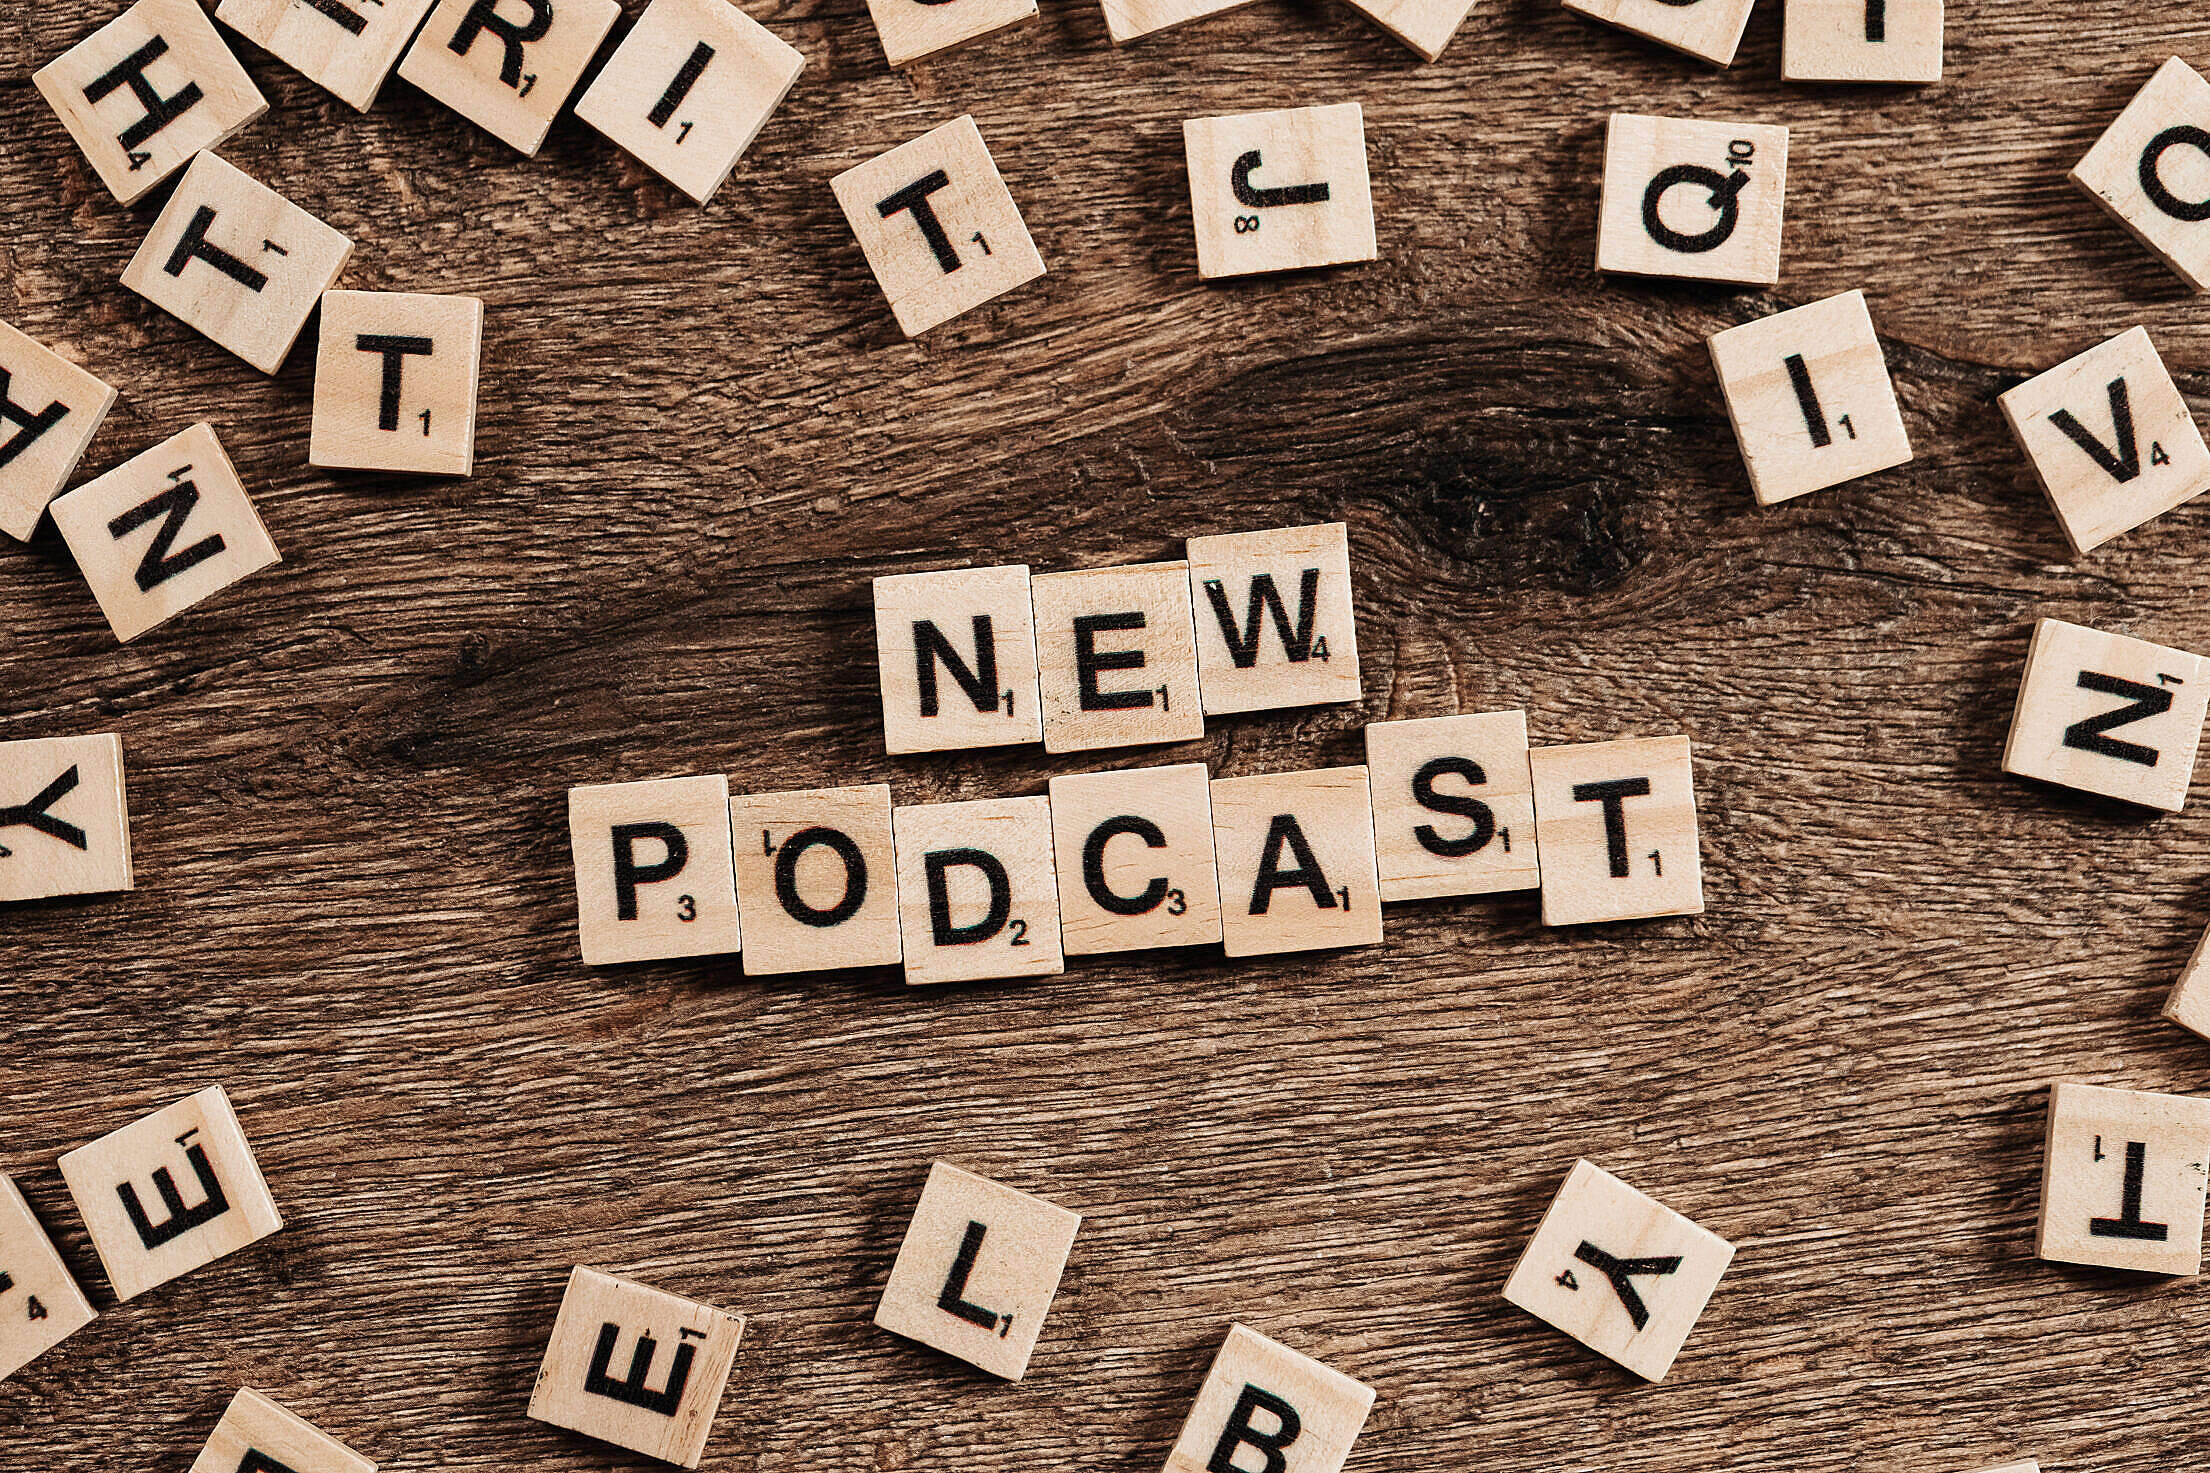 New Podcast Free Stock Photo